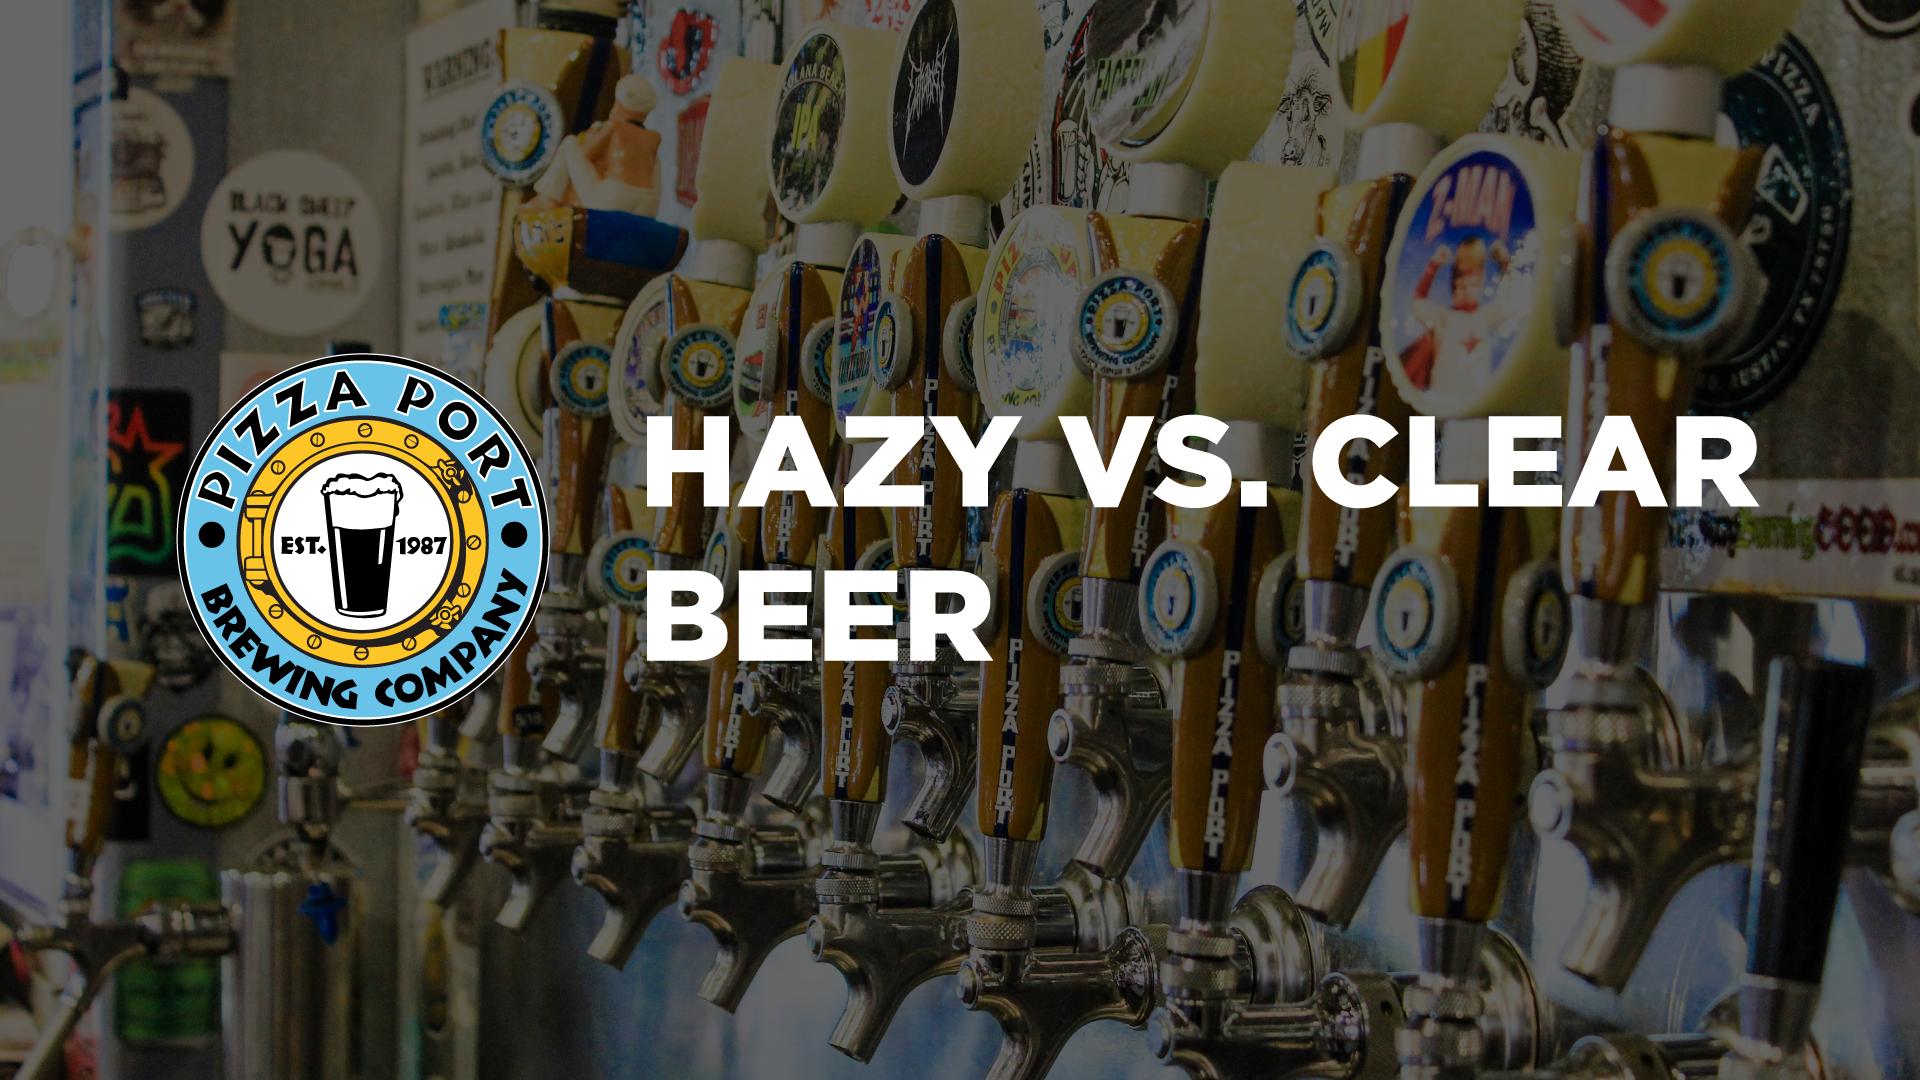 Hazy vs. Clear Beer